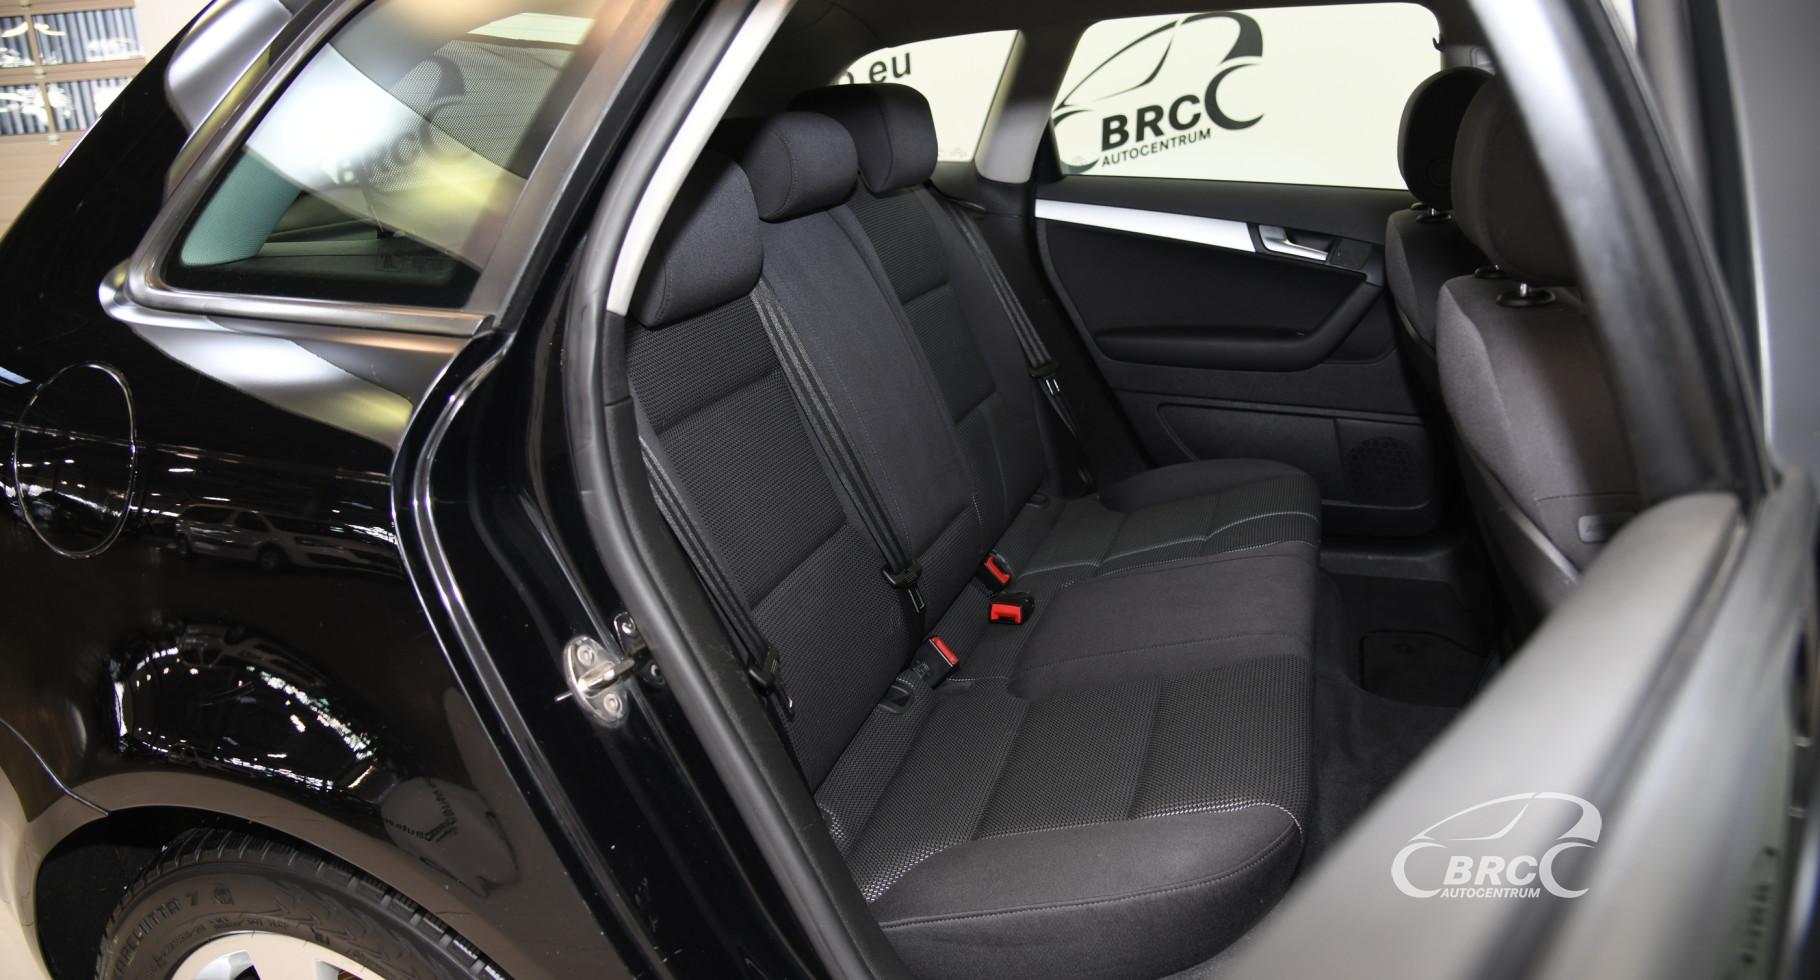 Audi A3 2.0 TDI Sportback Ambition